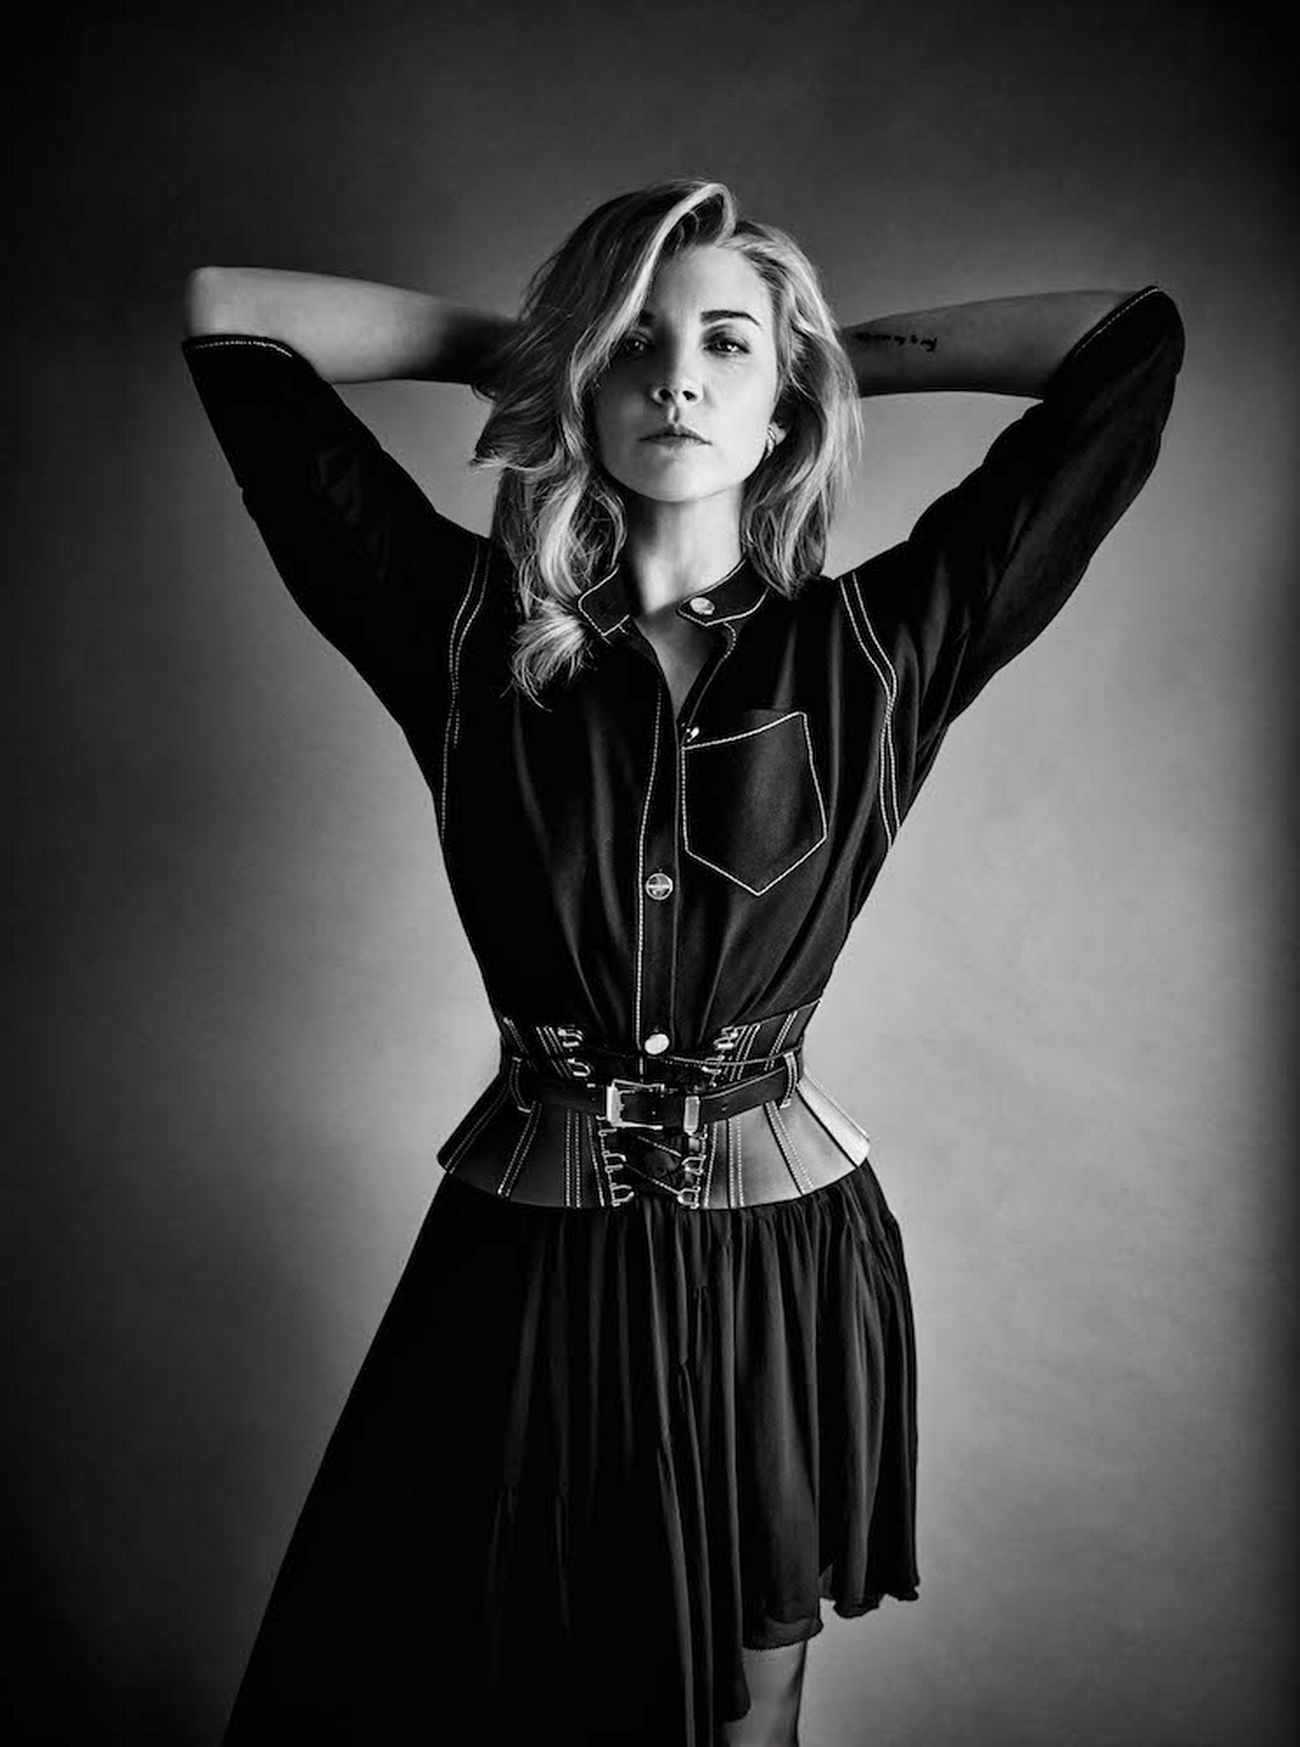 Natalie-Dormer-Interview-May-201800007.jpg